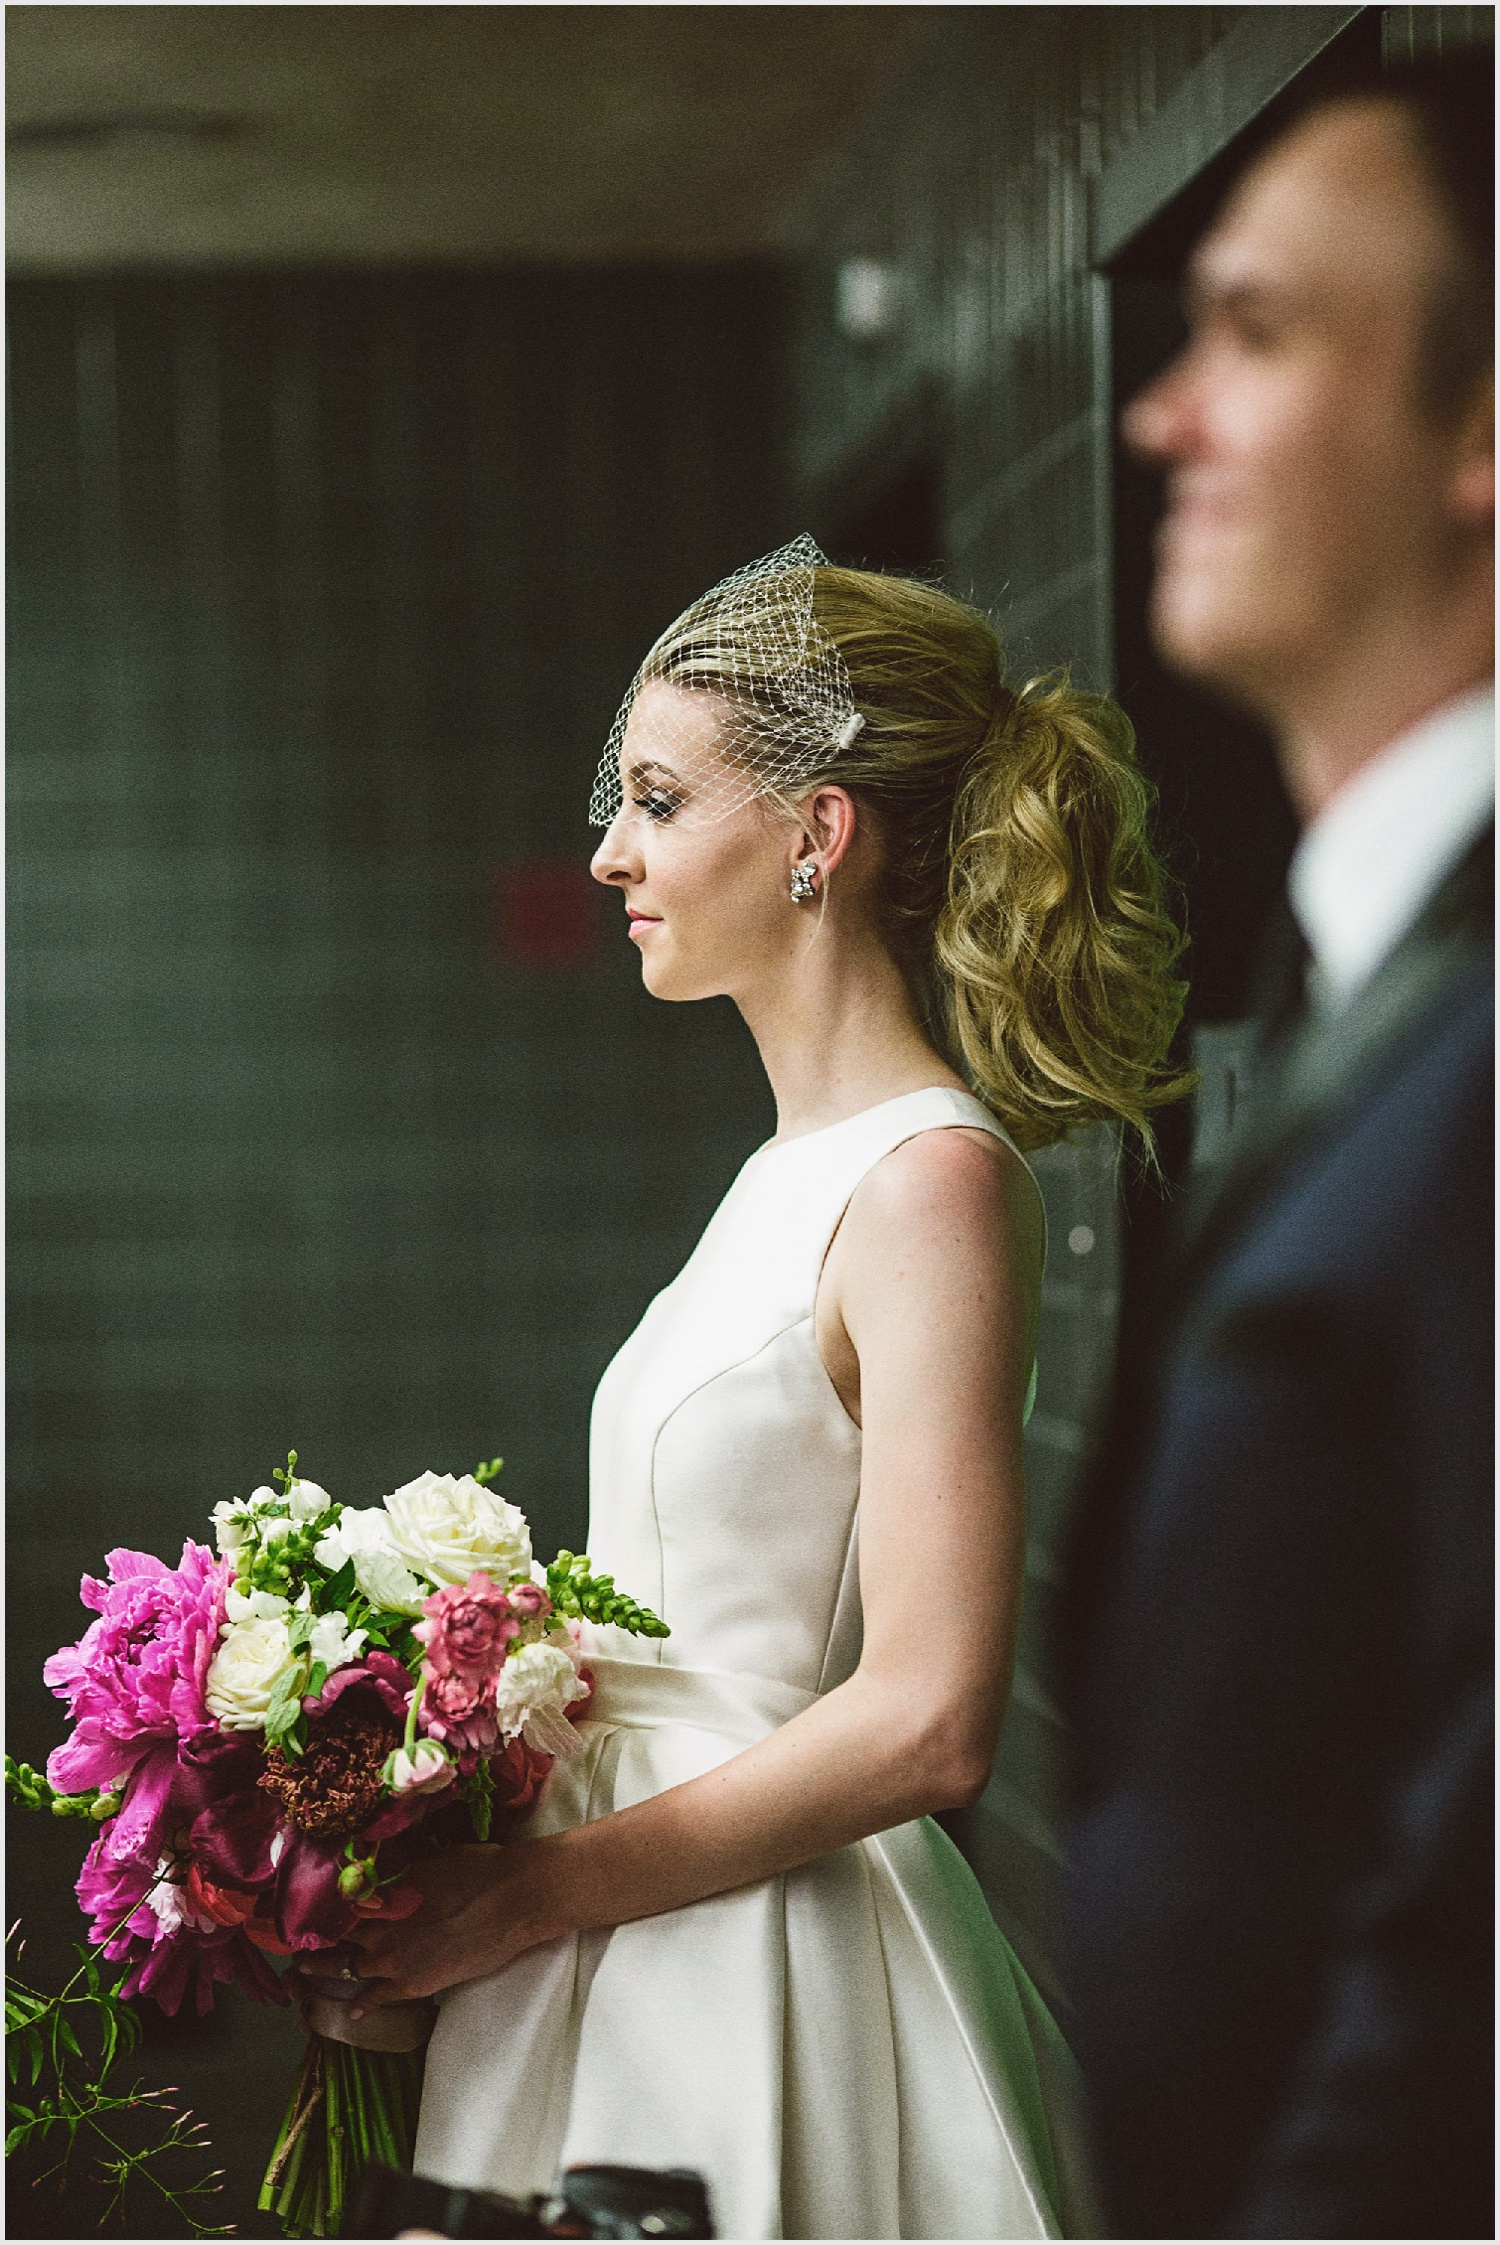 solar_arts_wedding_minneapolis_by_lucas_botz_photography_0020.jpg